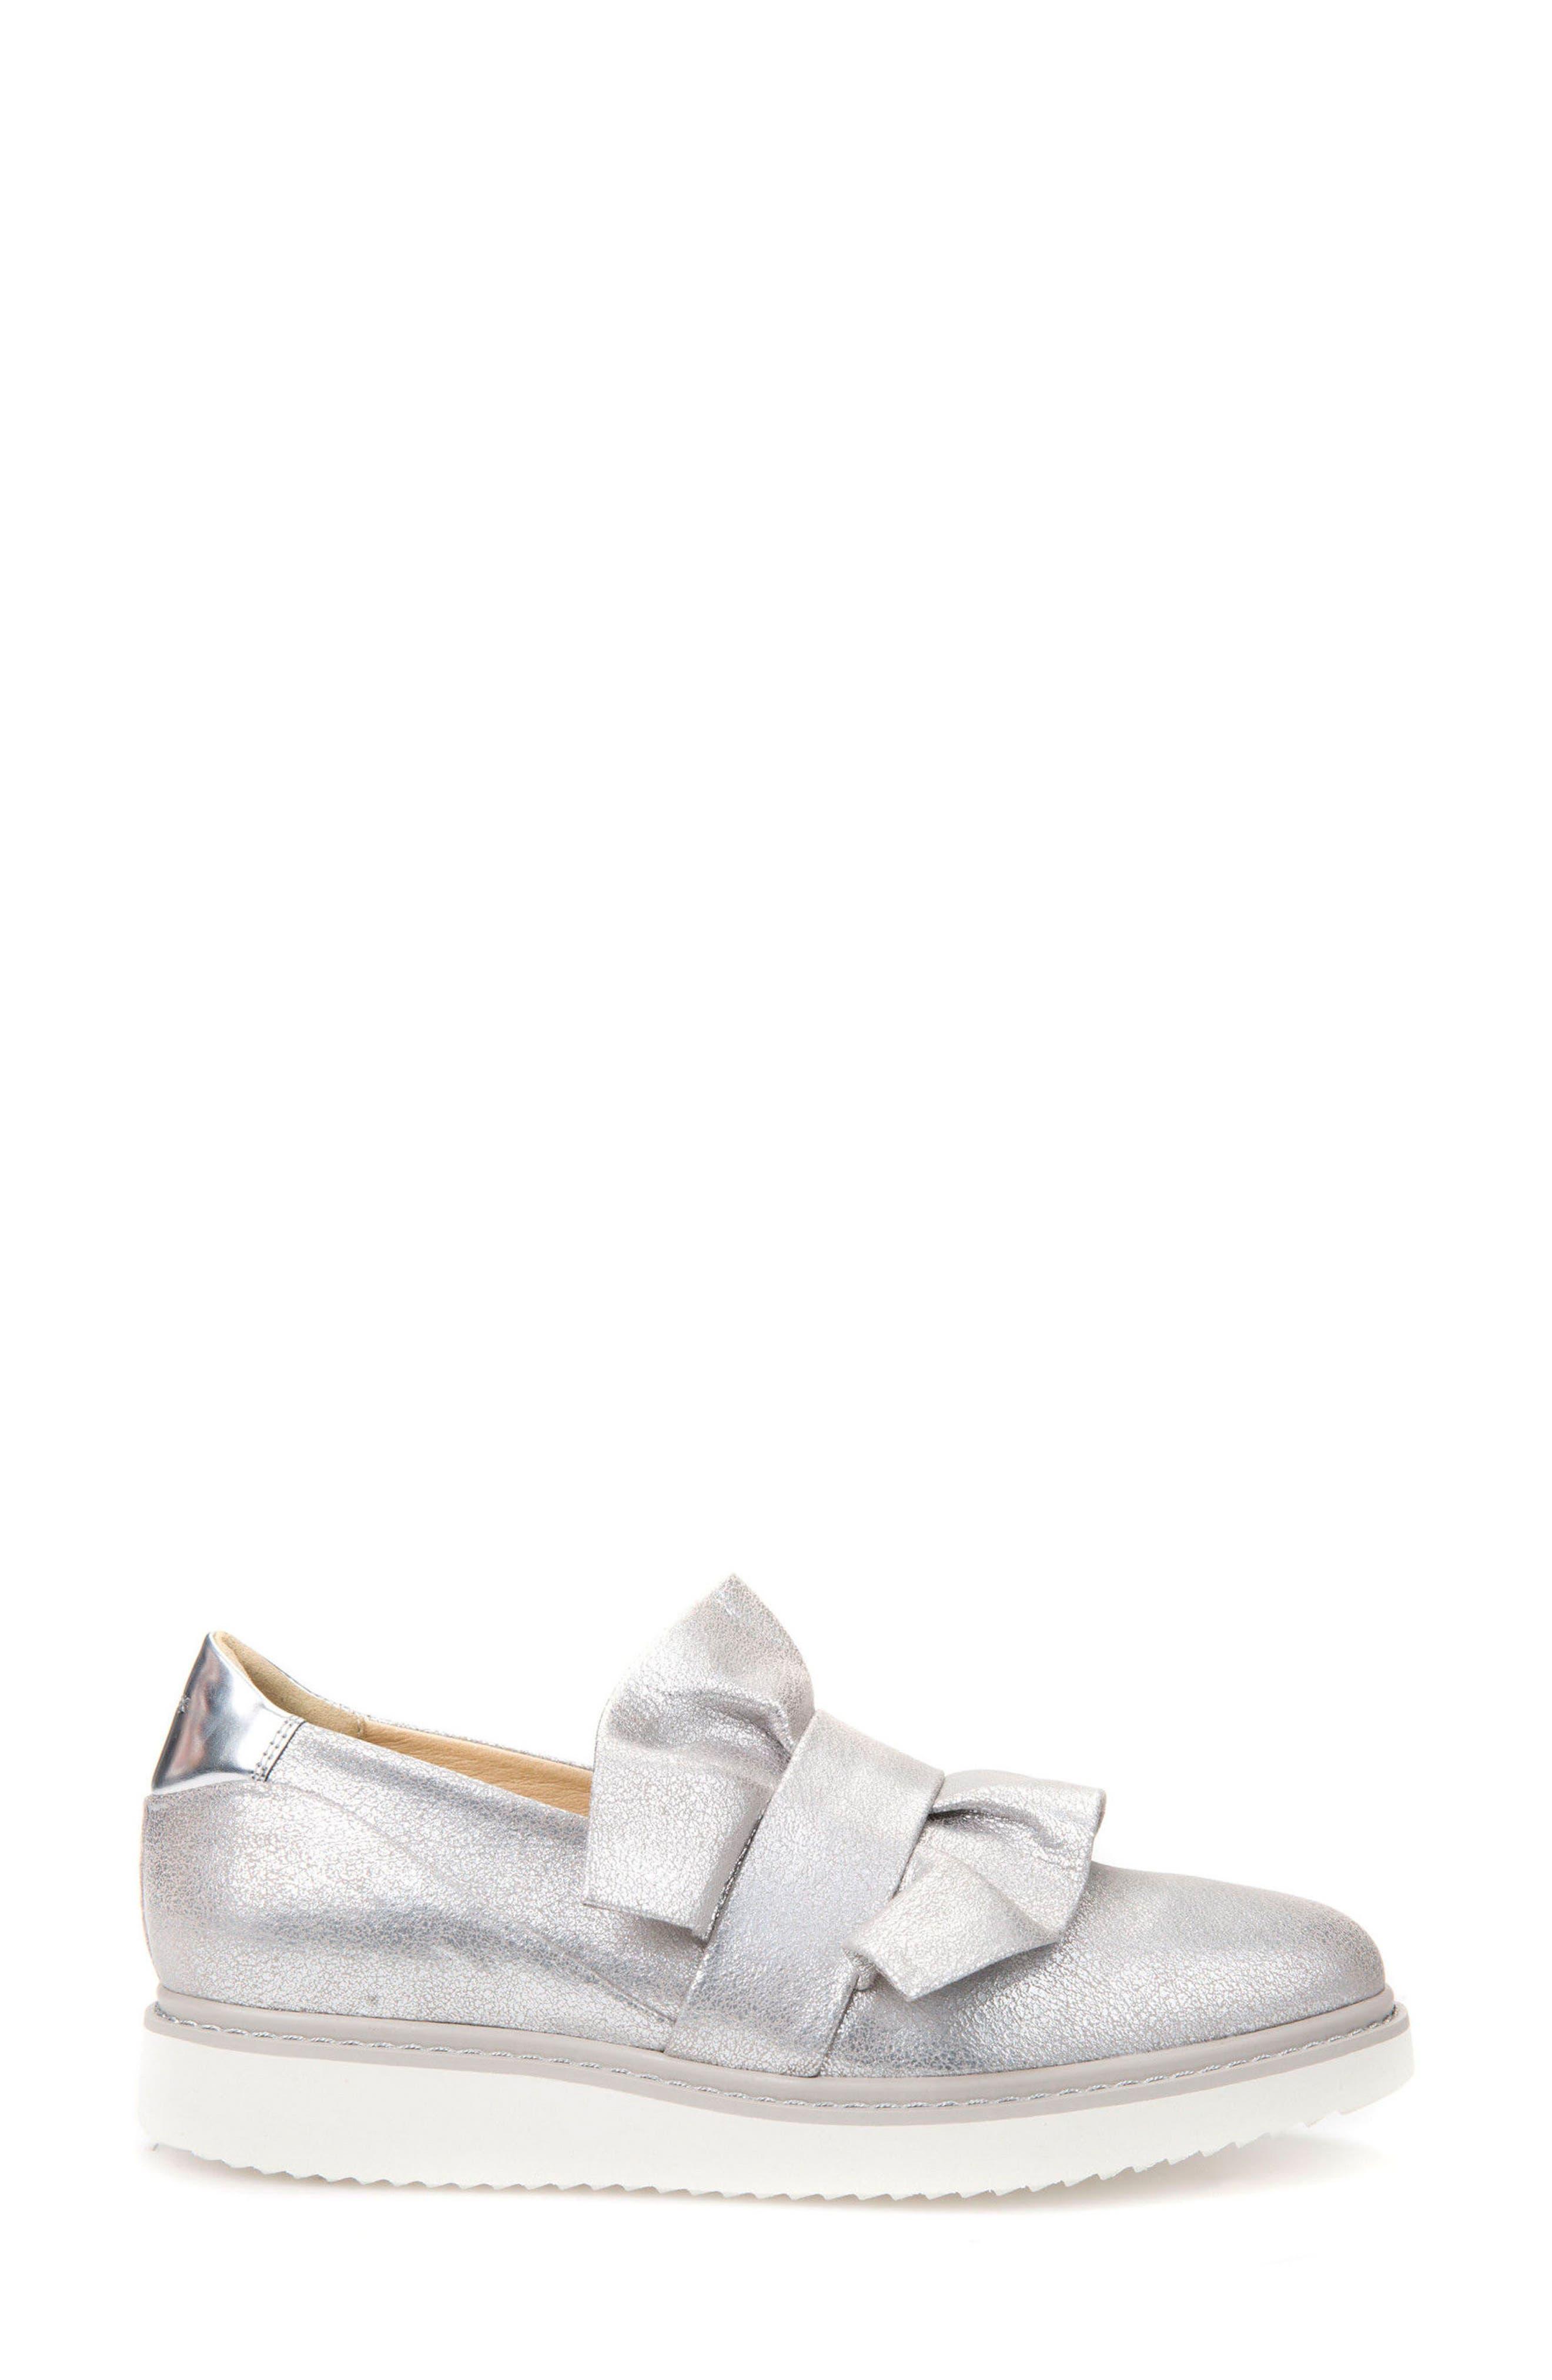 Thymar 15 Slip-On Sneaker,                             Alternate thumbnail 3, color,                             Silver Fabric